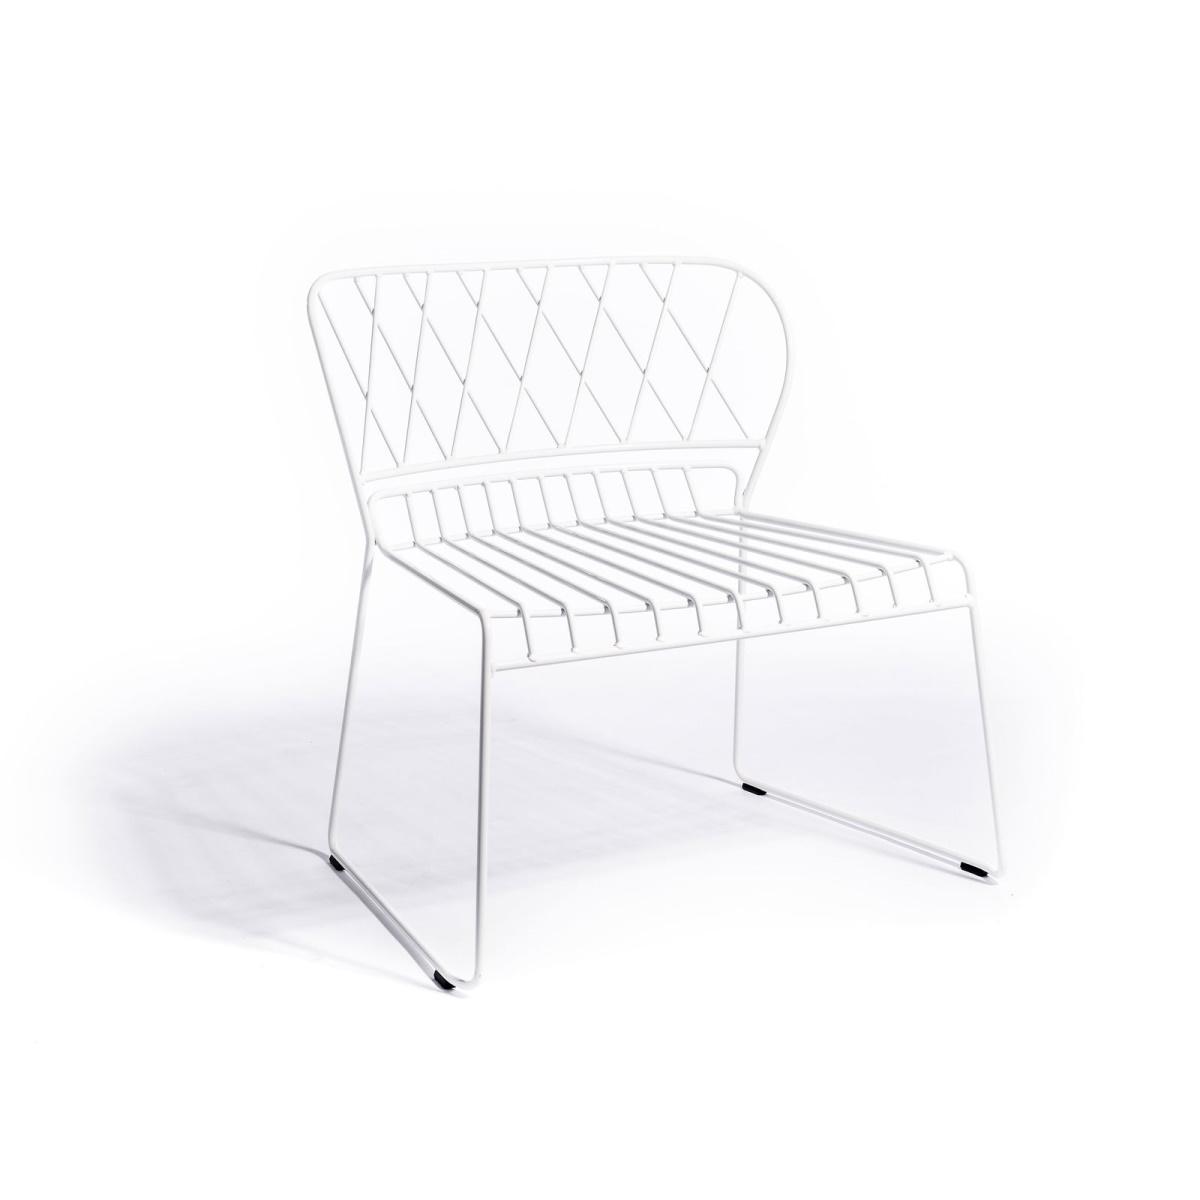 Resö Lounge stol vit metall, Skargaarden